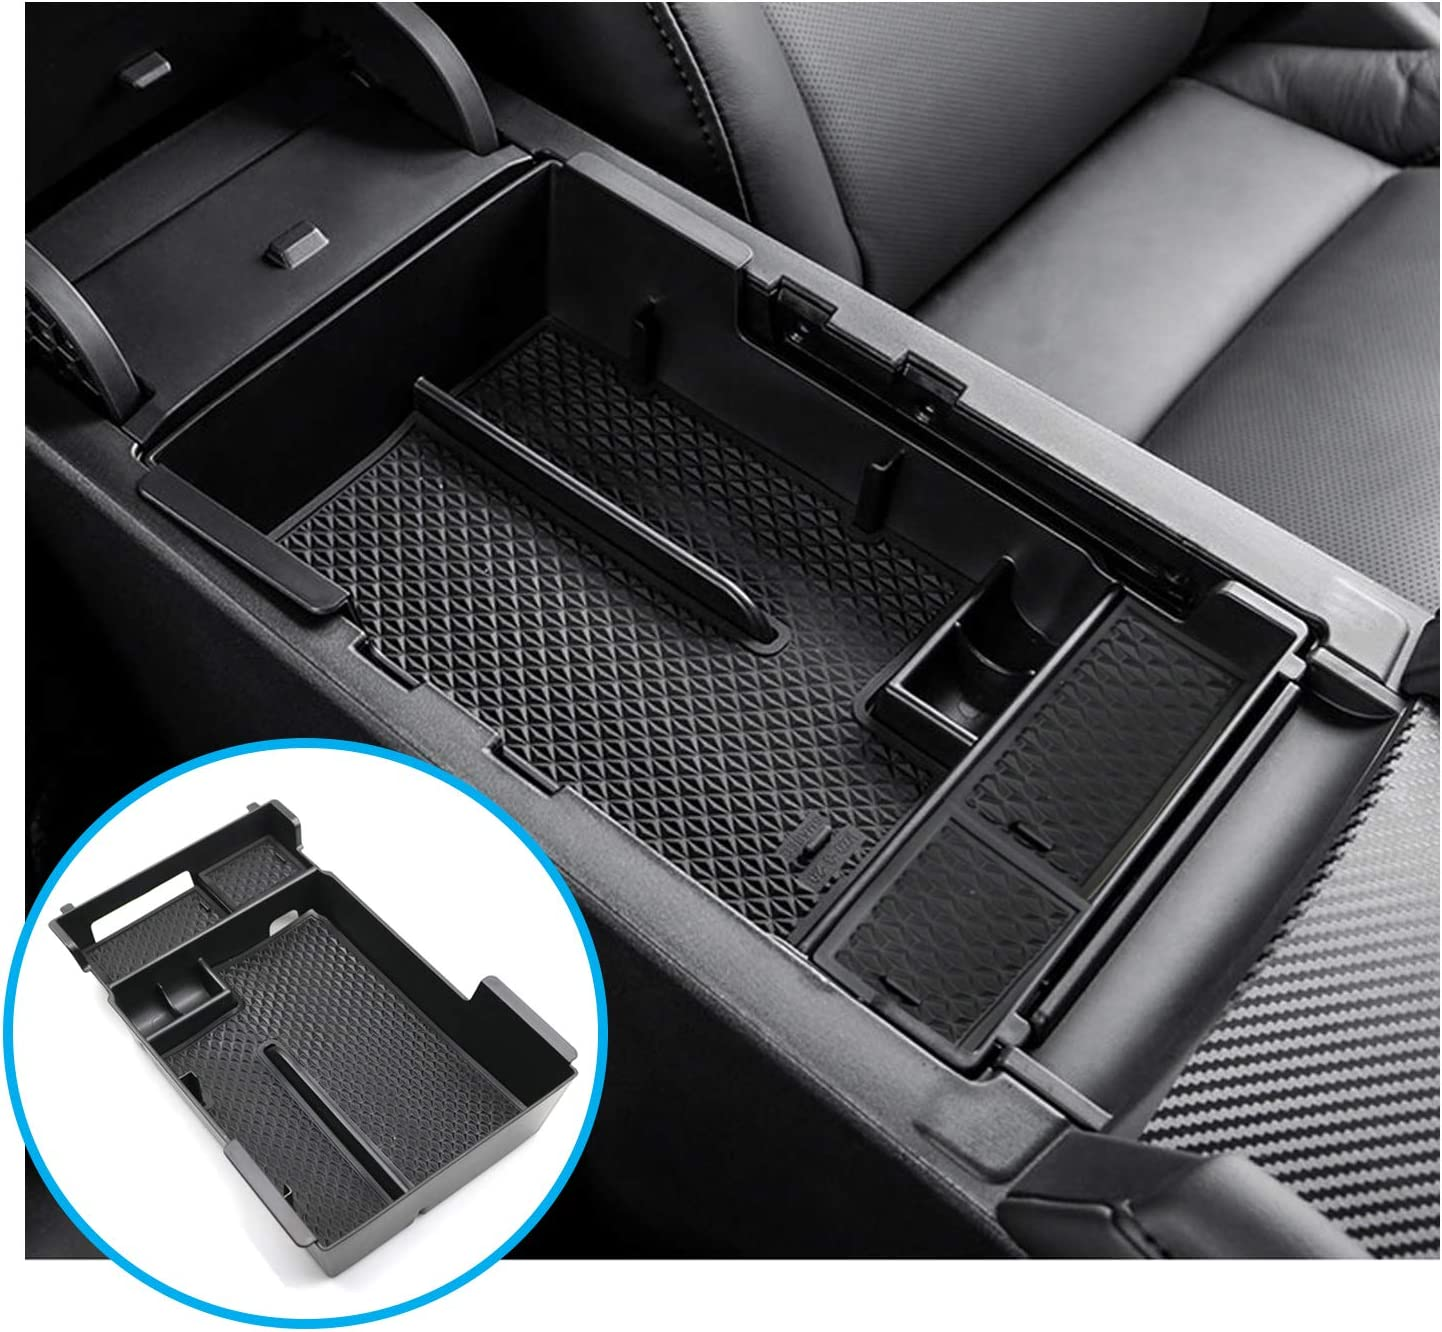 RUIYA Center Console Organizer Tray Compatible with 2019 2020 Mazda 3 Car Accessories Insert ABS Black Materials Tray Storage Box